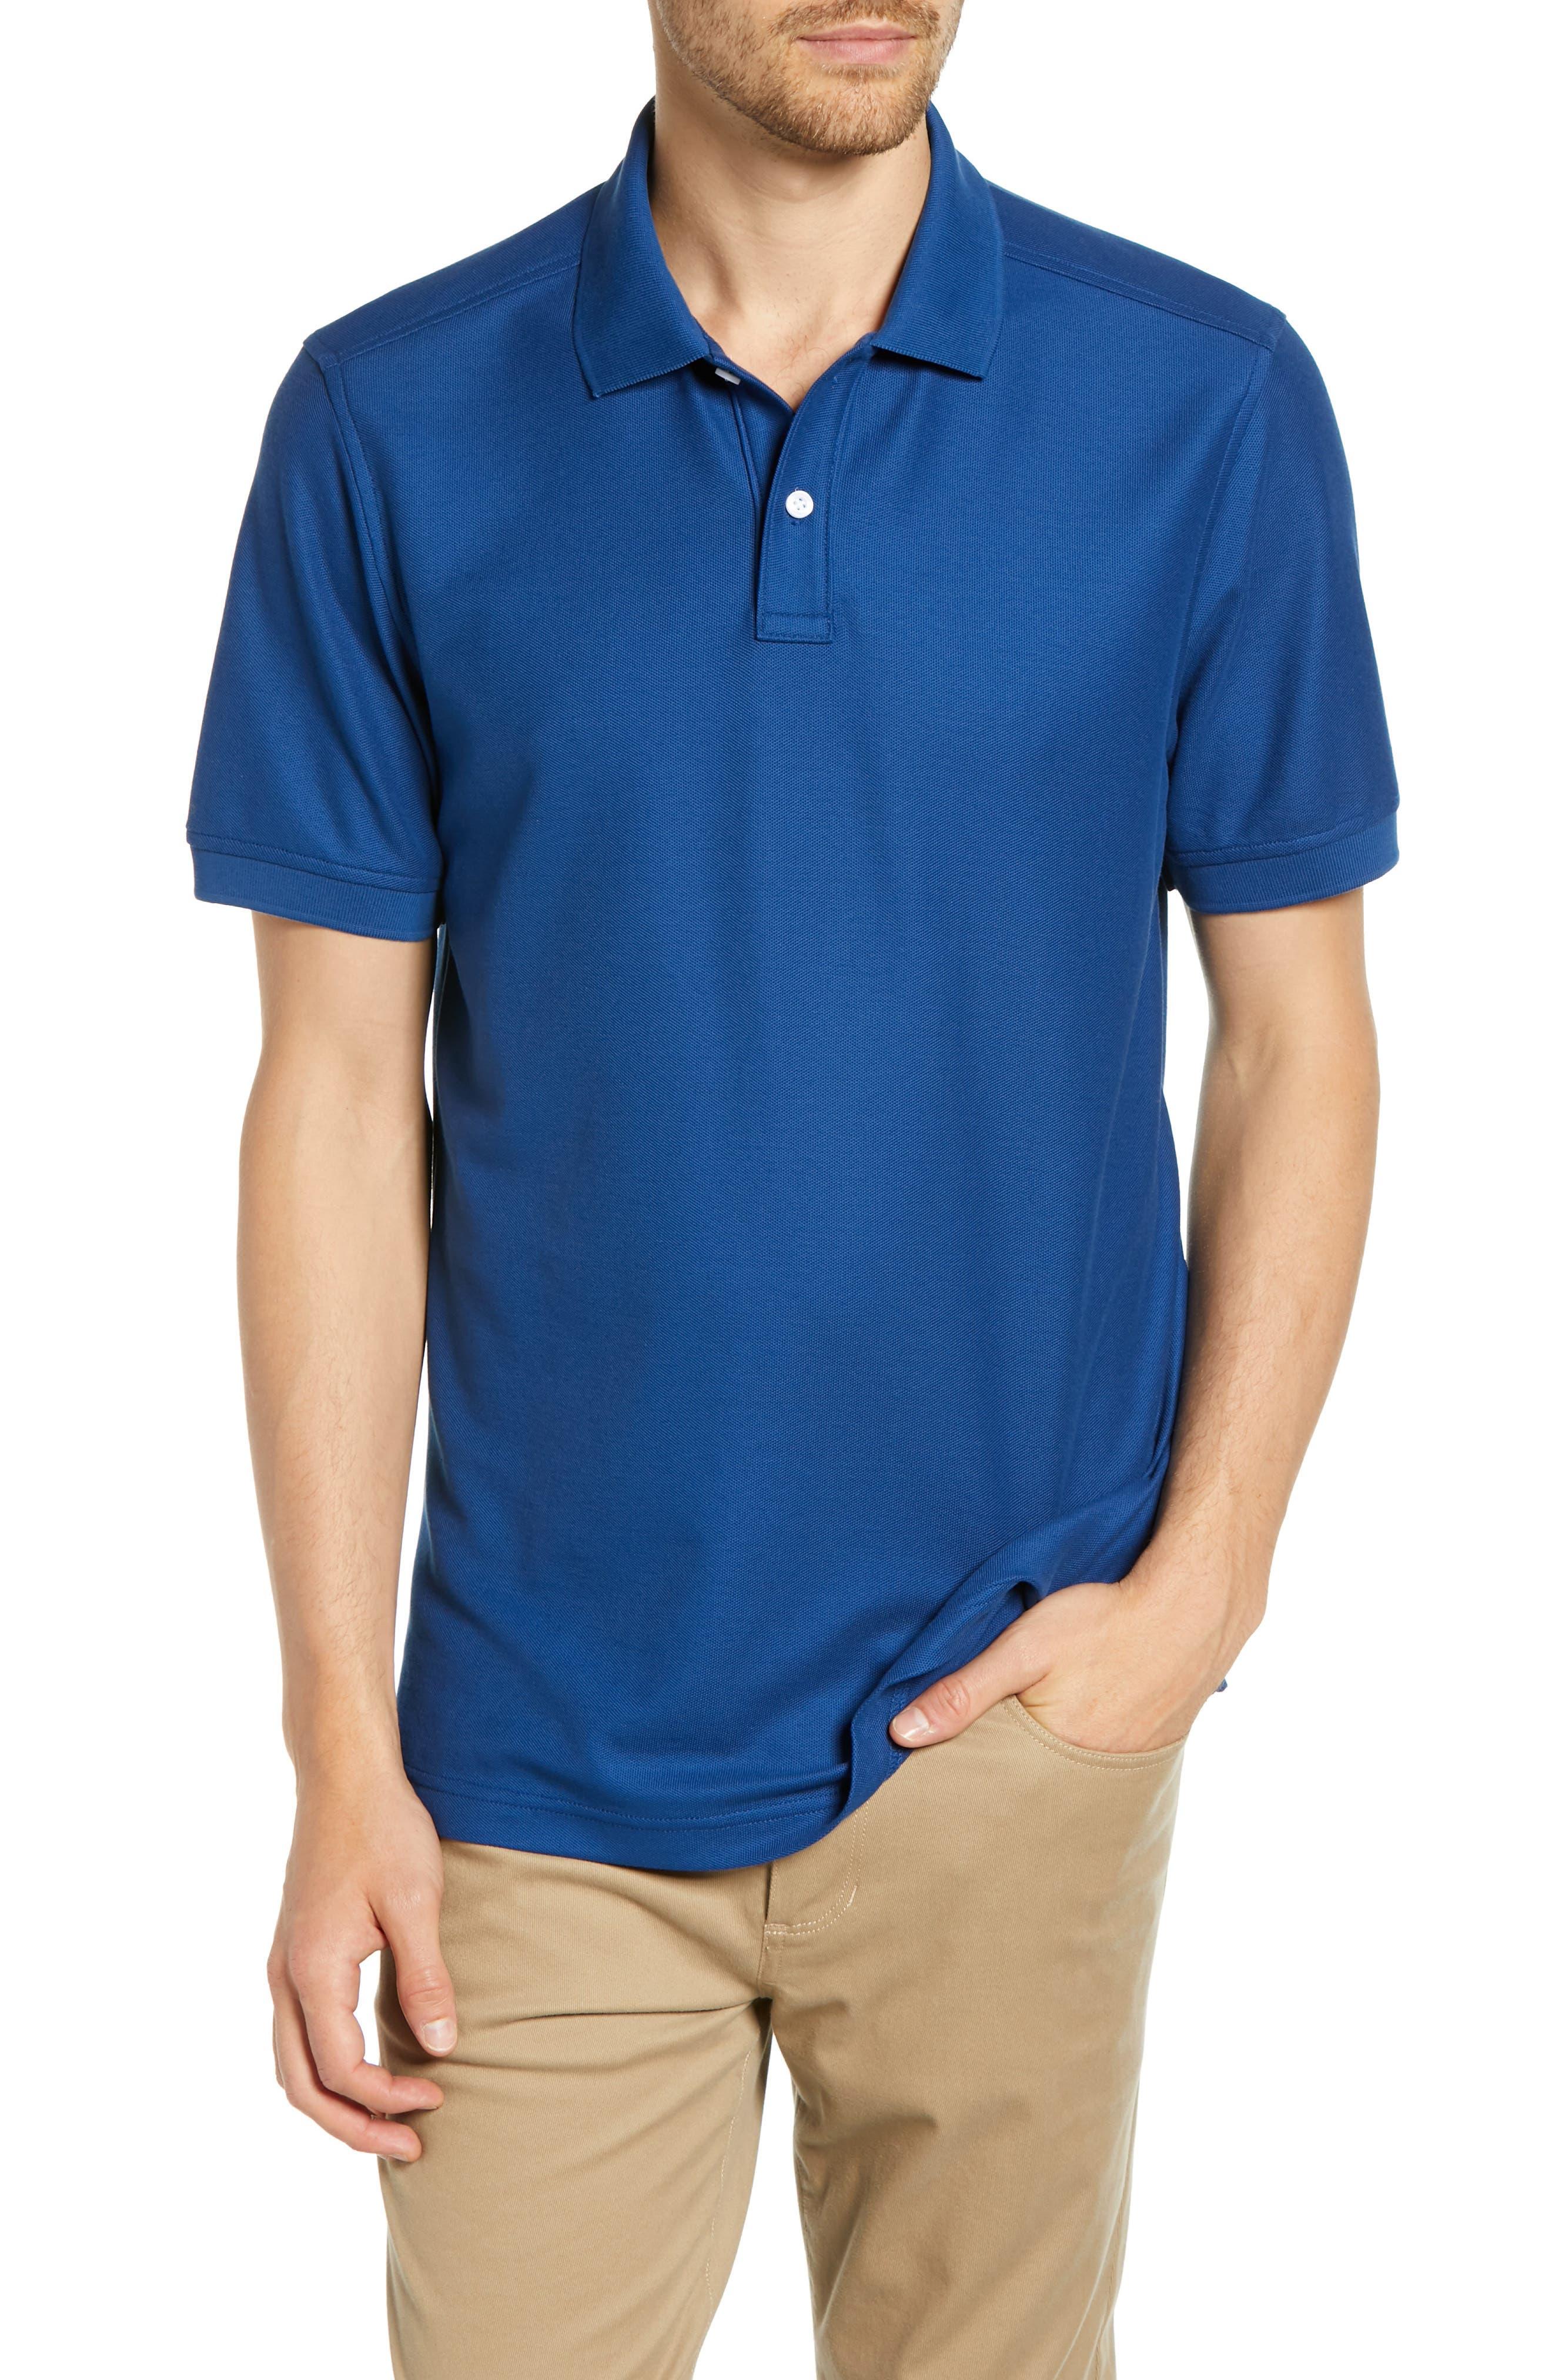 Regular Fit Piqué Polo, Main, color, BLUE CASPIA